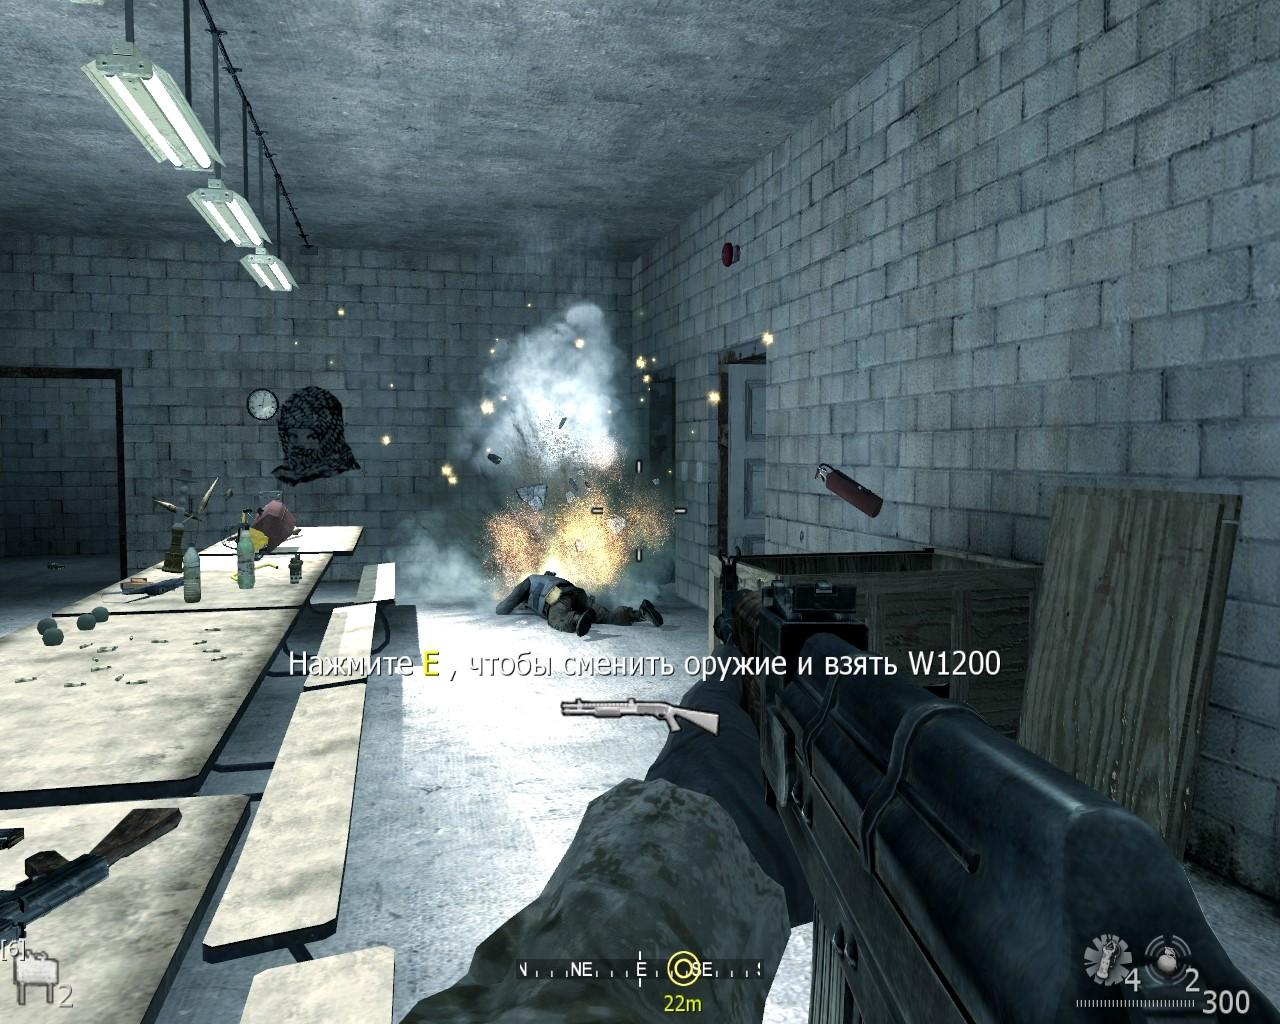 Рис. 10 – Call of Duty 4: Modern Warfare